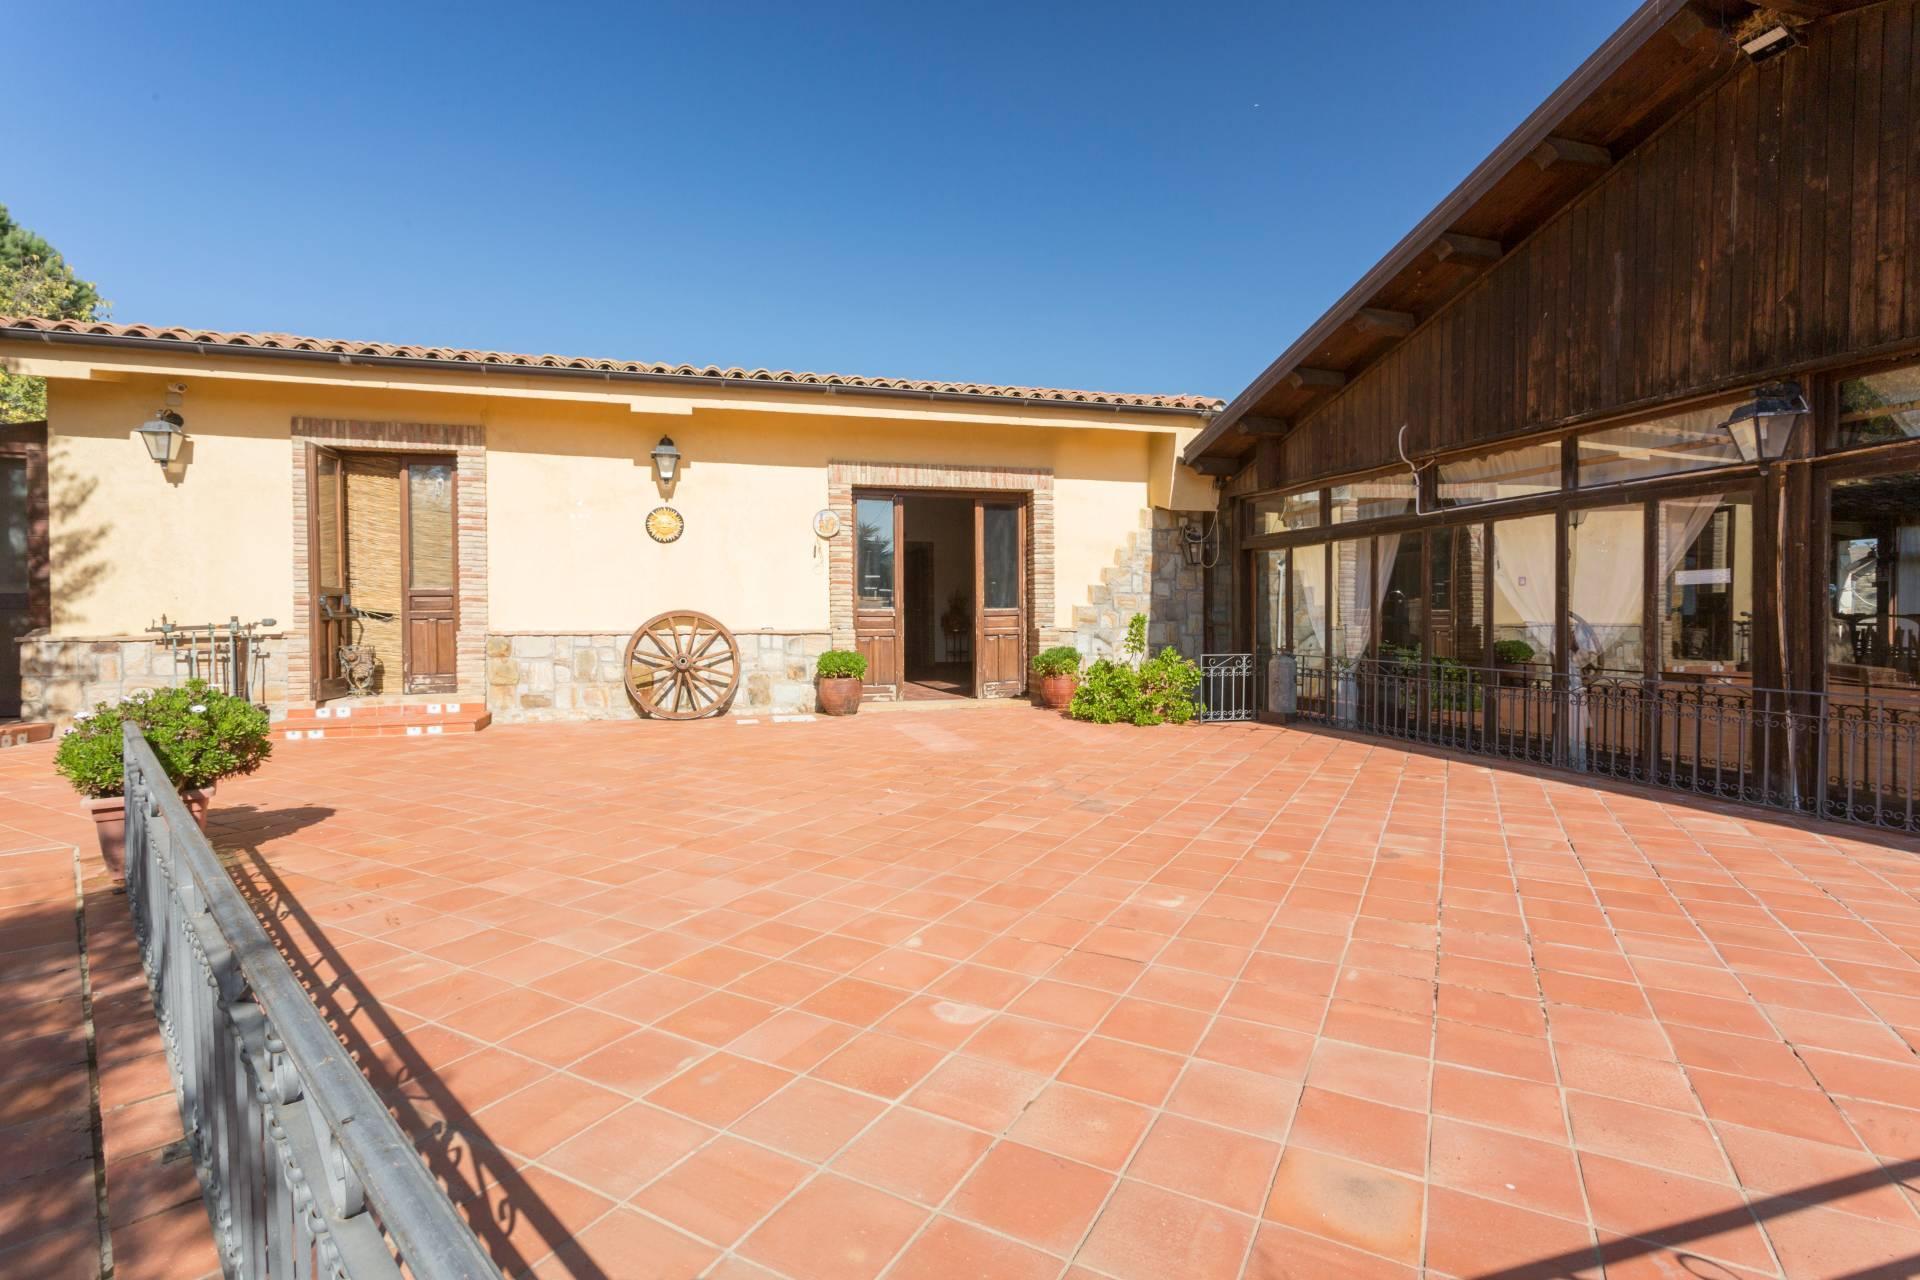 Villa in Vendita a Piazza Armerina: 5 locali, 550 mq - Foto 20